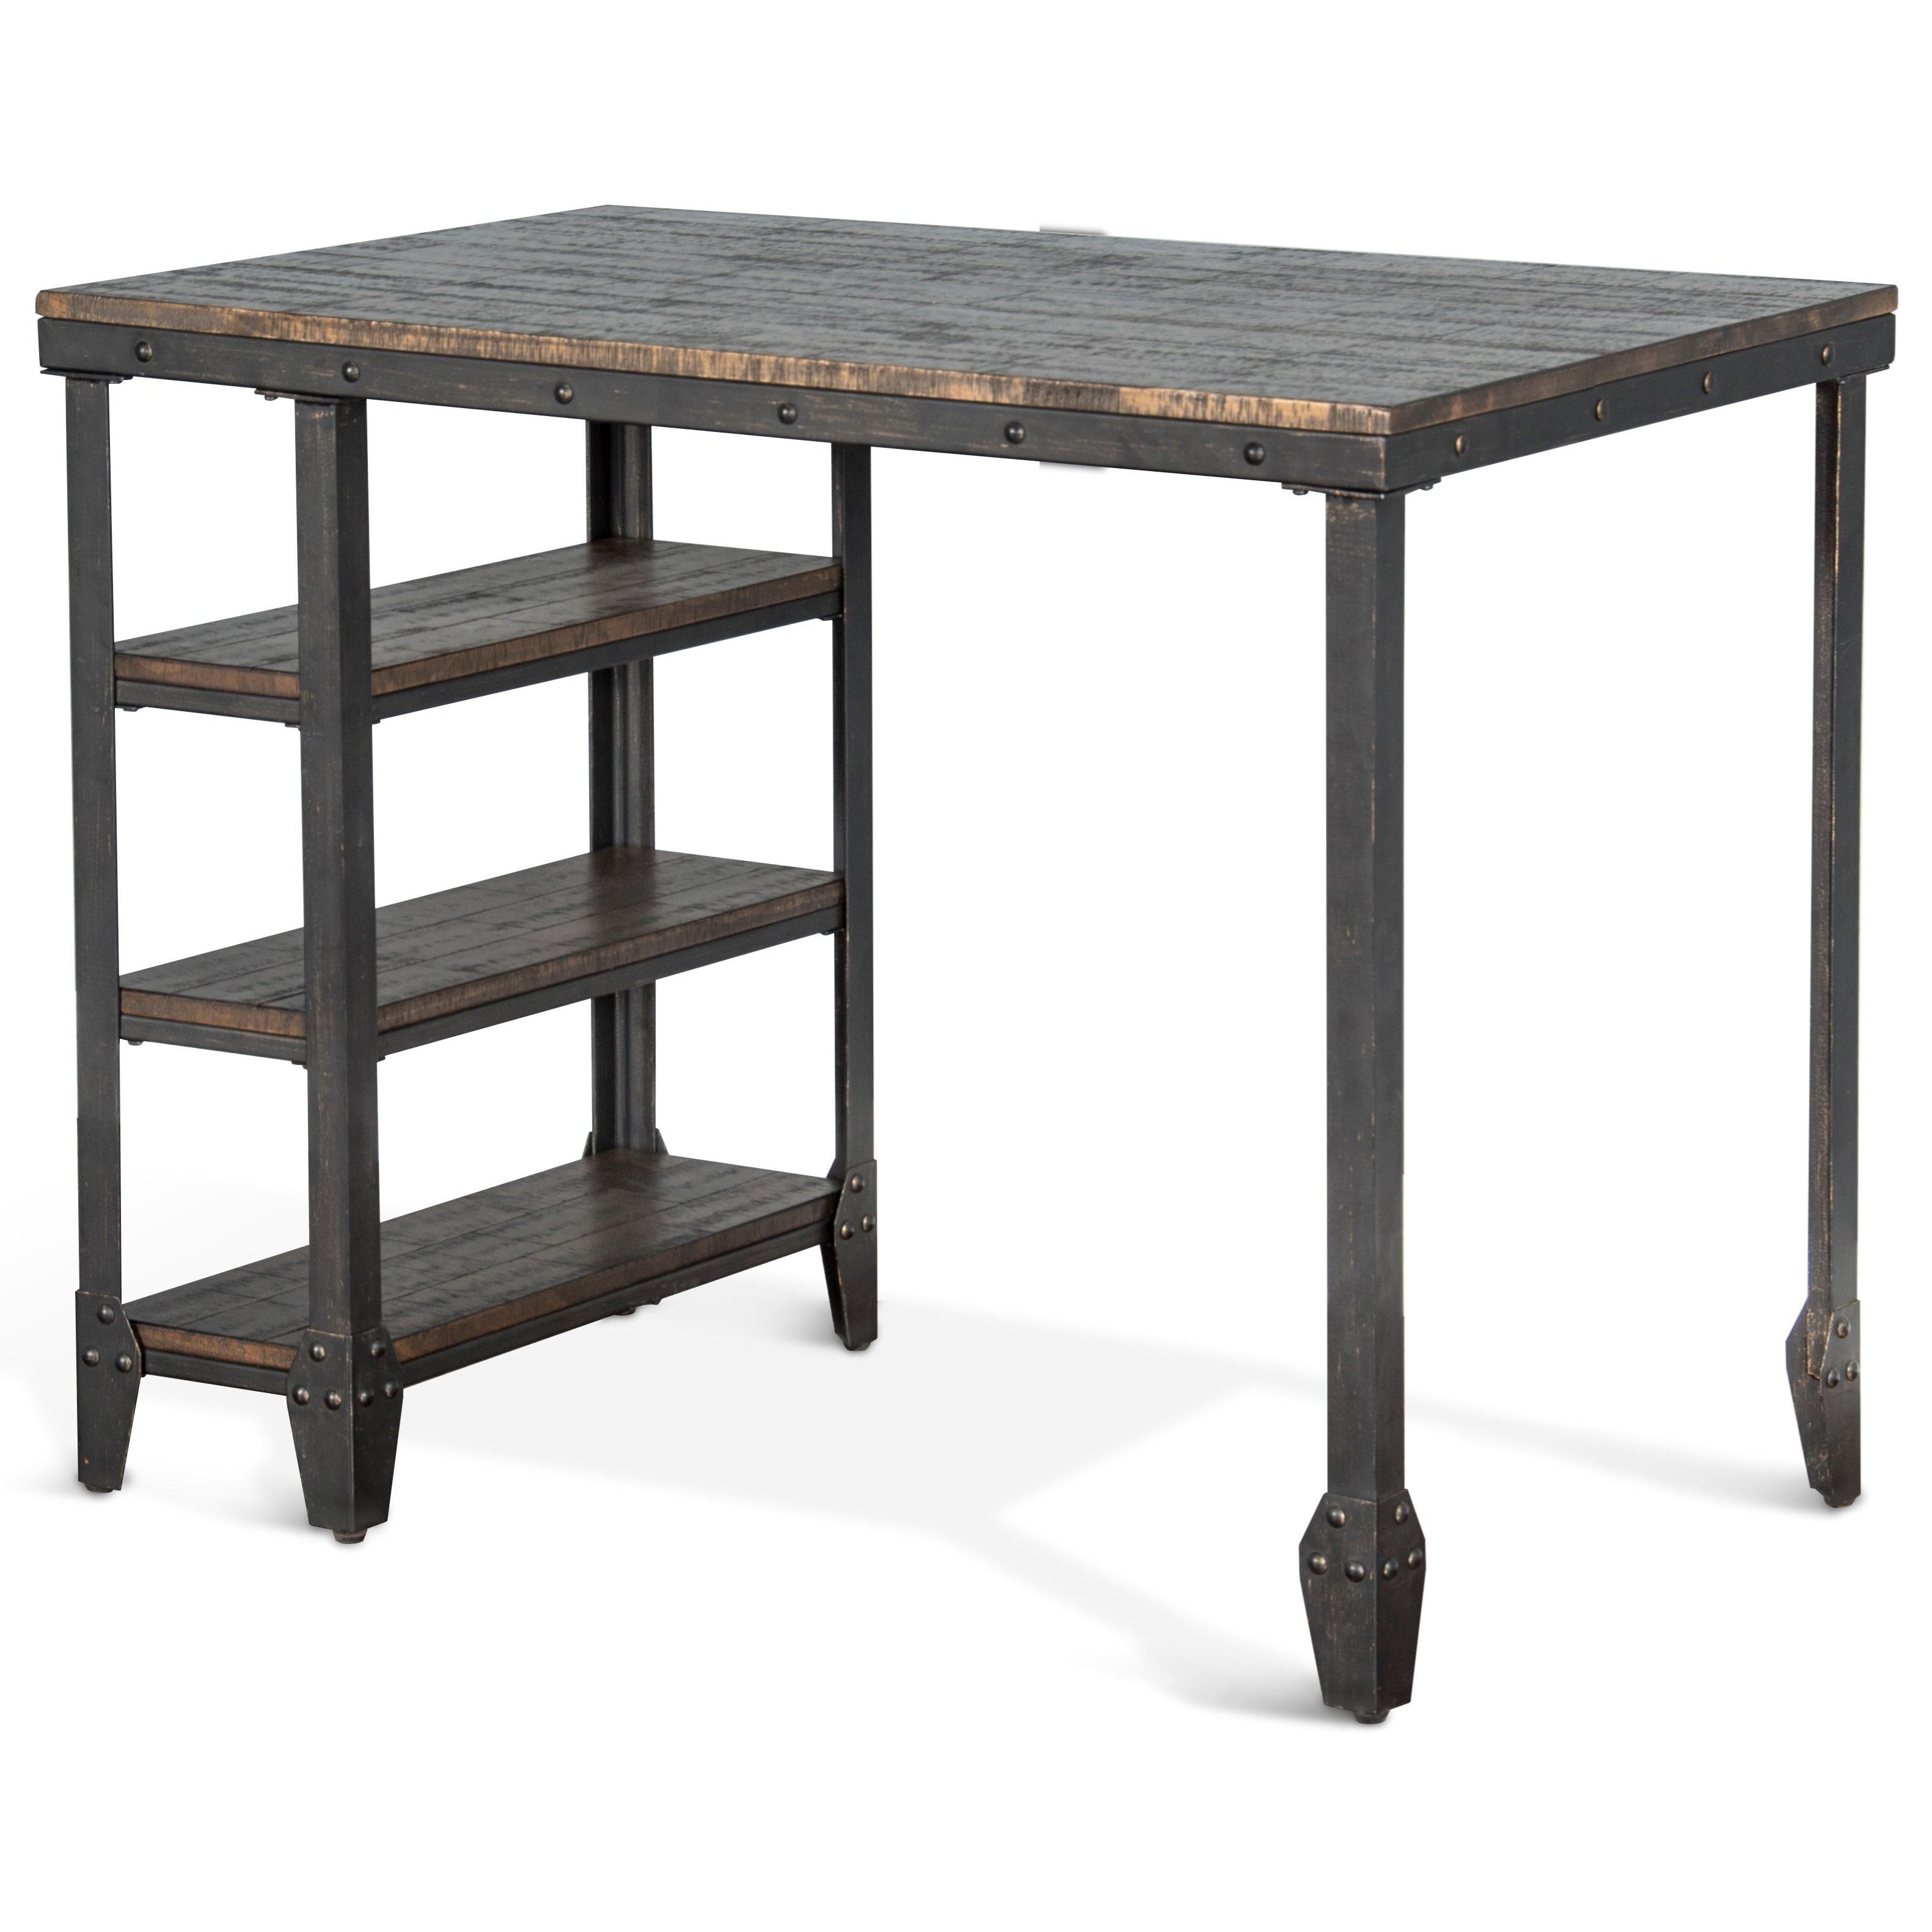 Sunny Designs Metro FlexLamar Metal Table W/ Wood Top U0026 Shelves ...